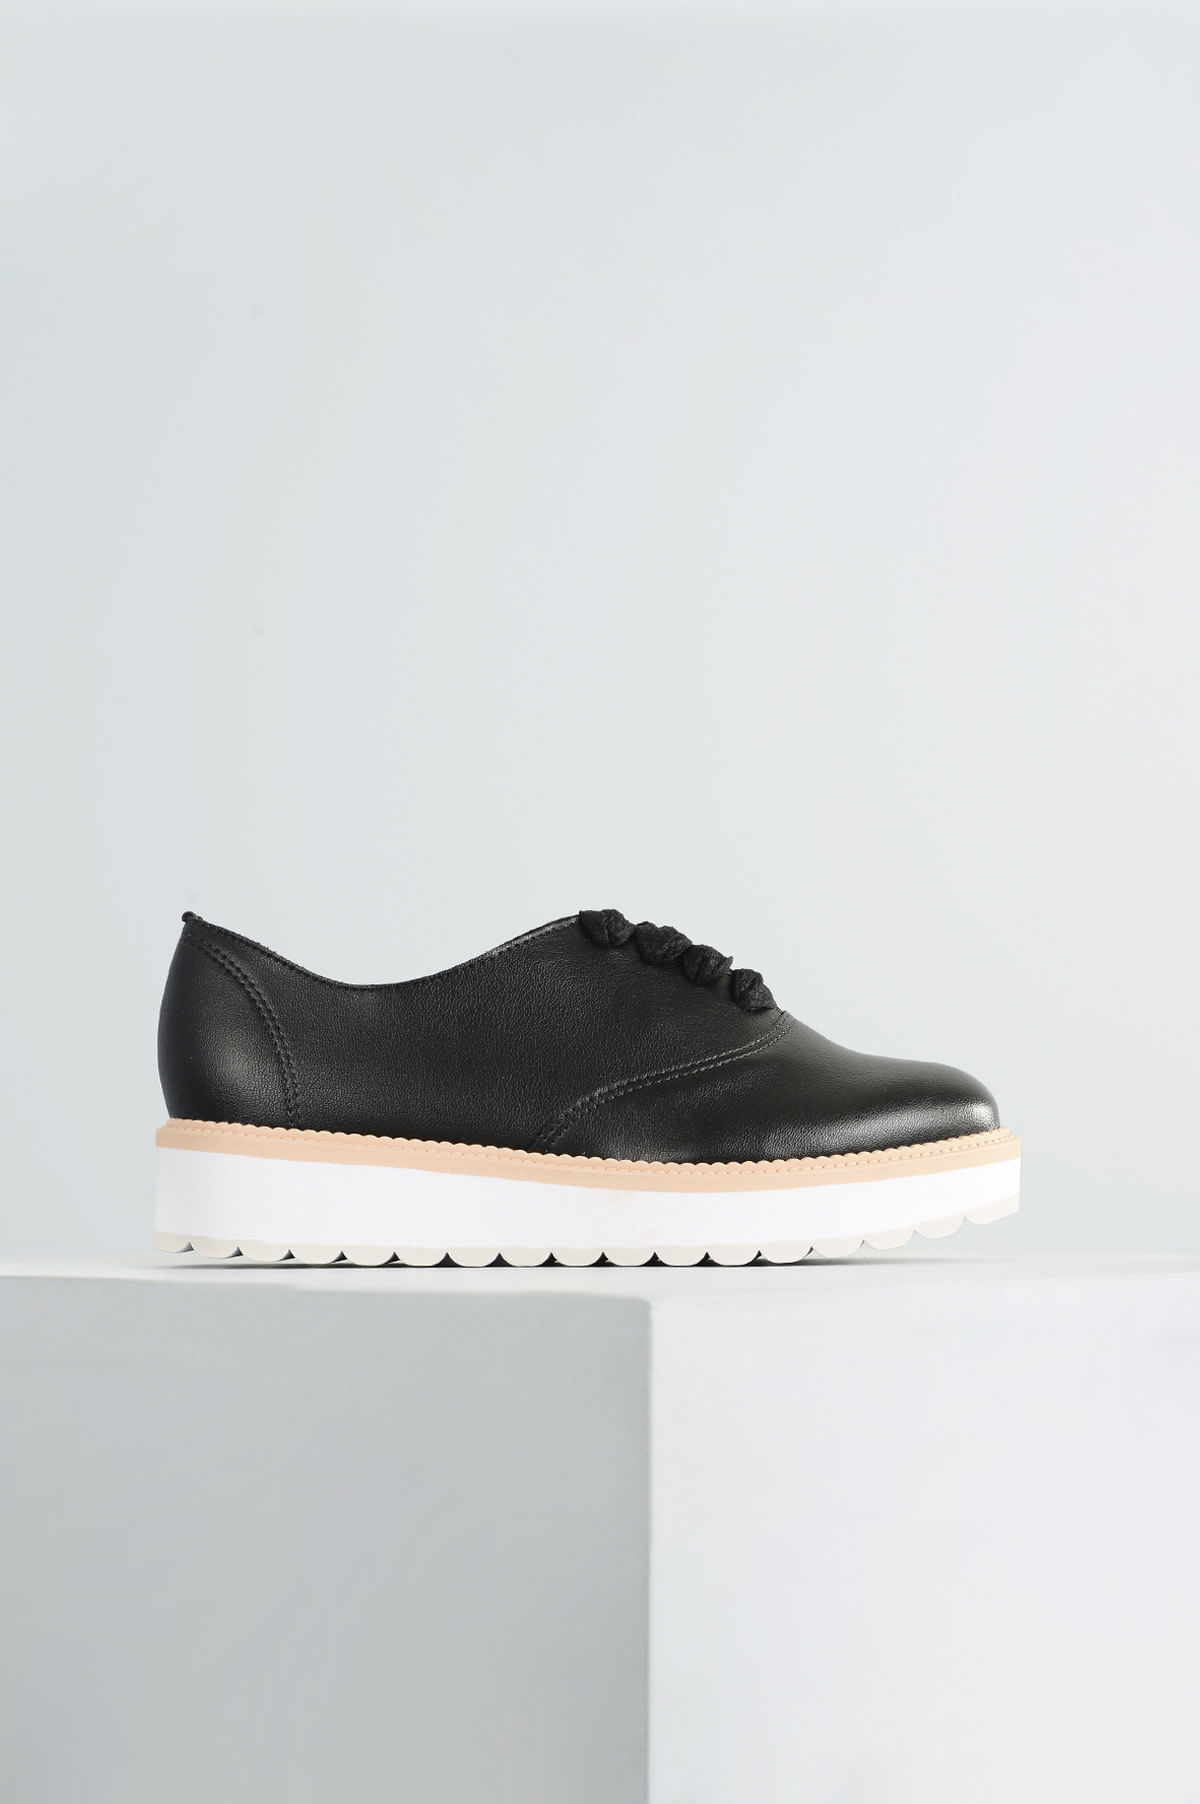 26131ff6ddd Oxford Feminino Geany Beira Rio SINT - PRETO - Mundial Calçados